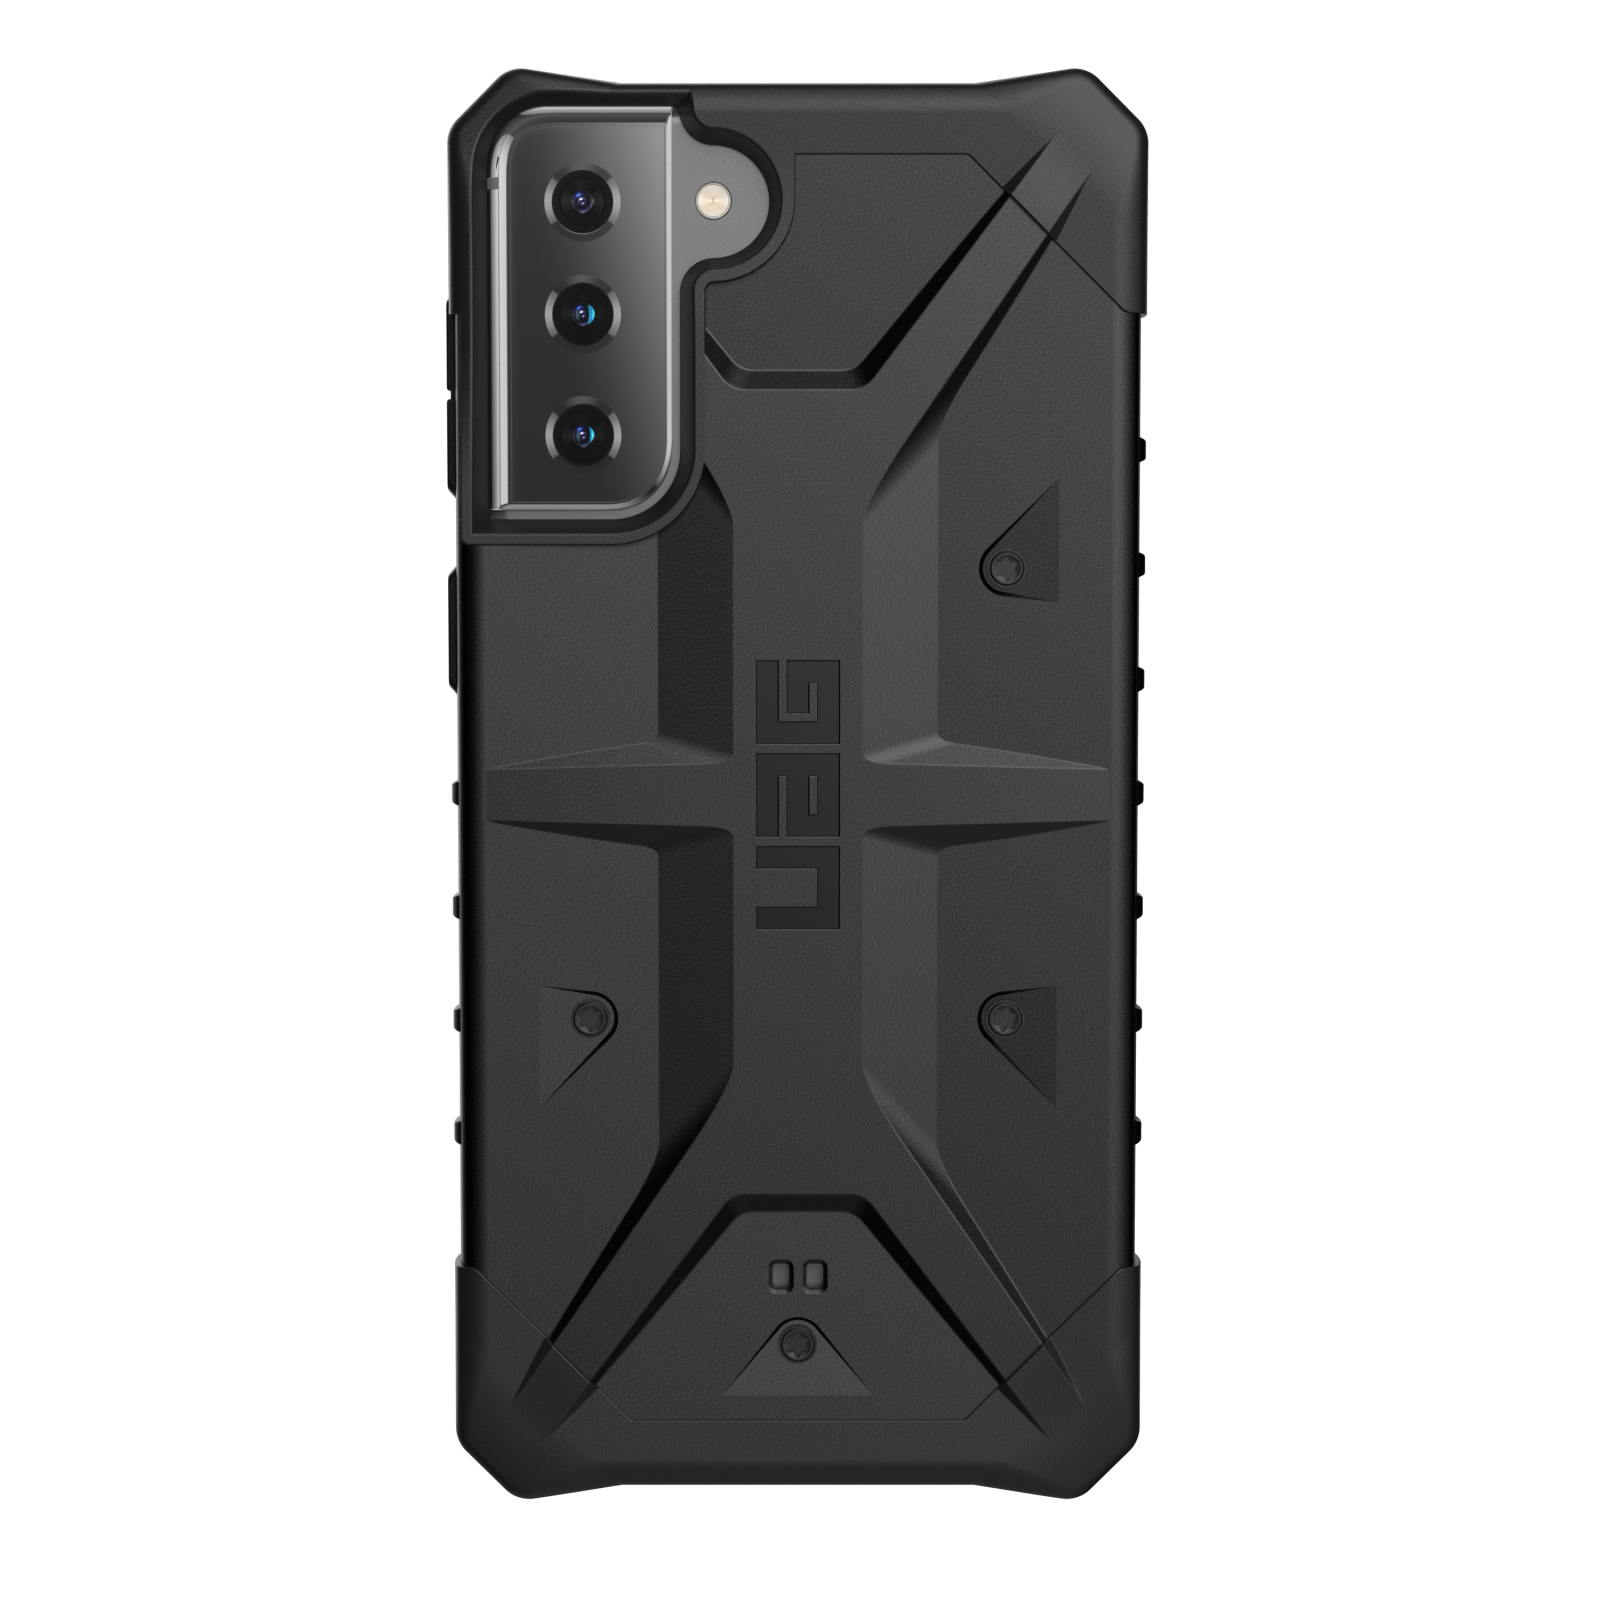 Pathfinder Series Case Galaxy S21 Plus Black